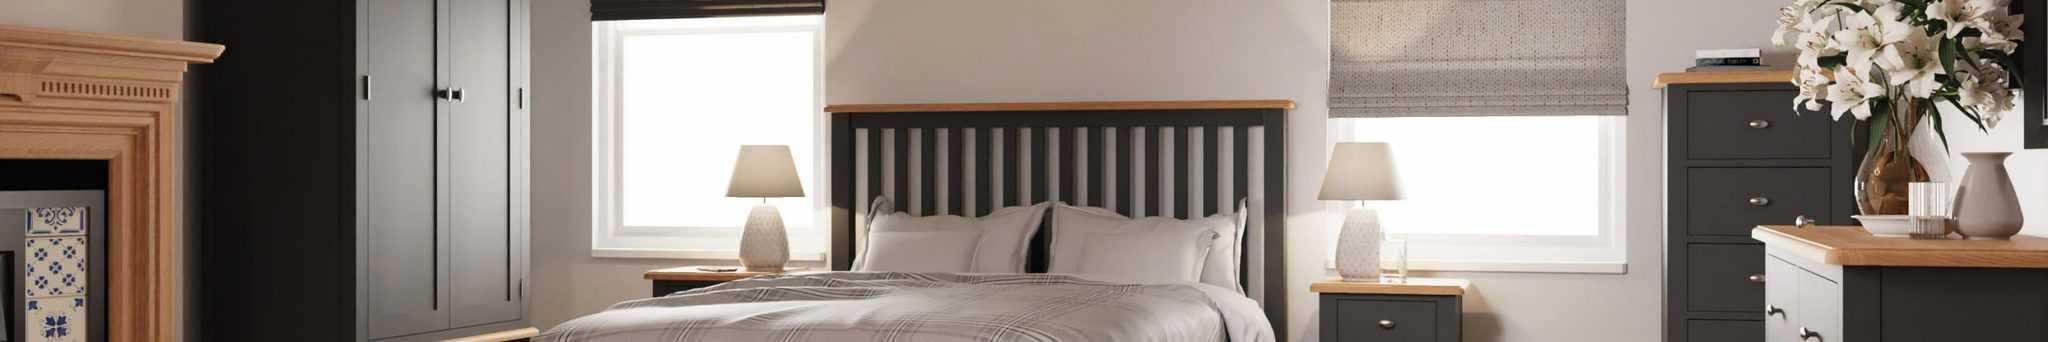 ga grey bedroom long